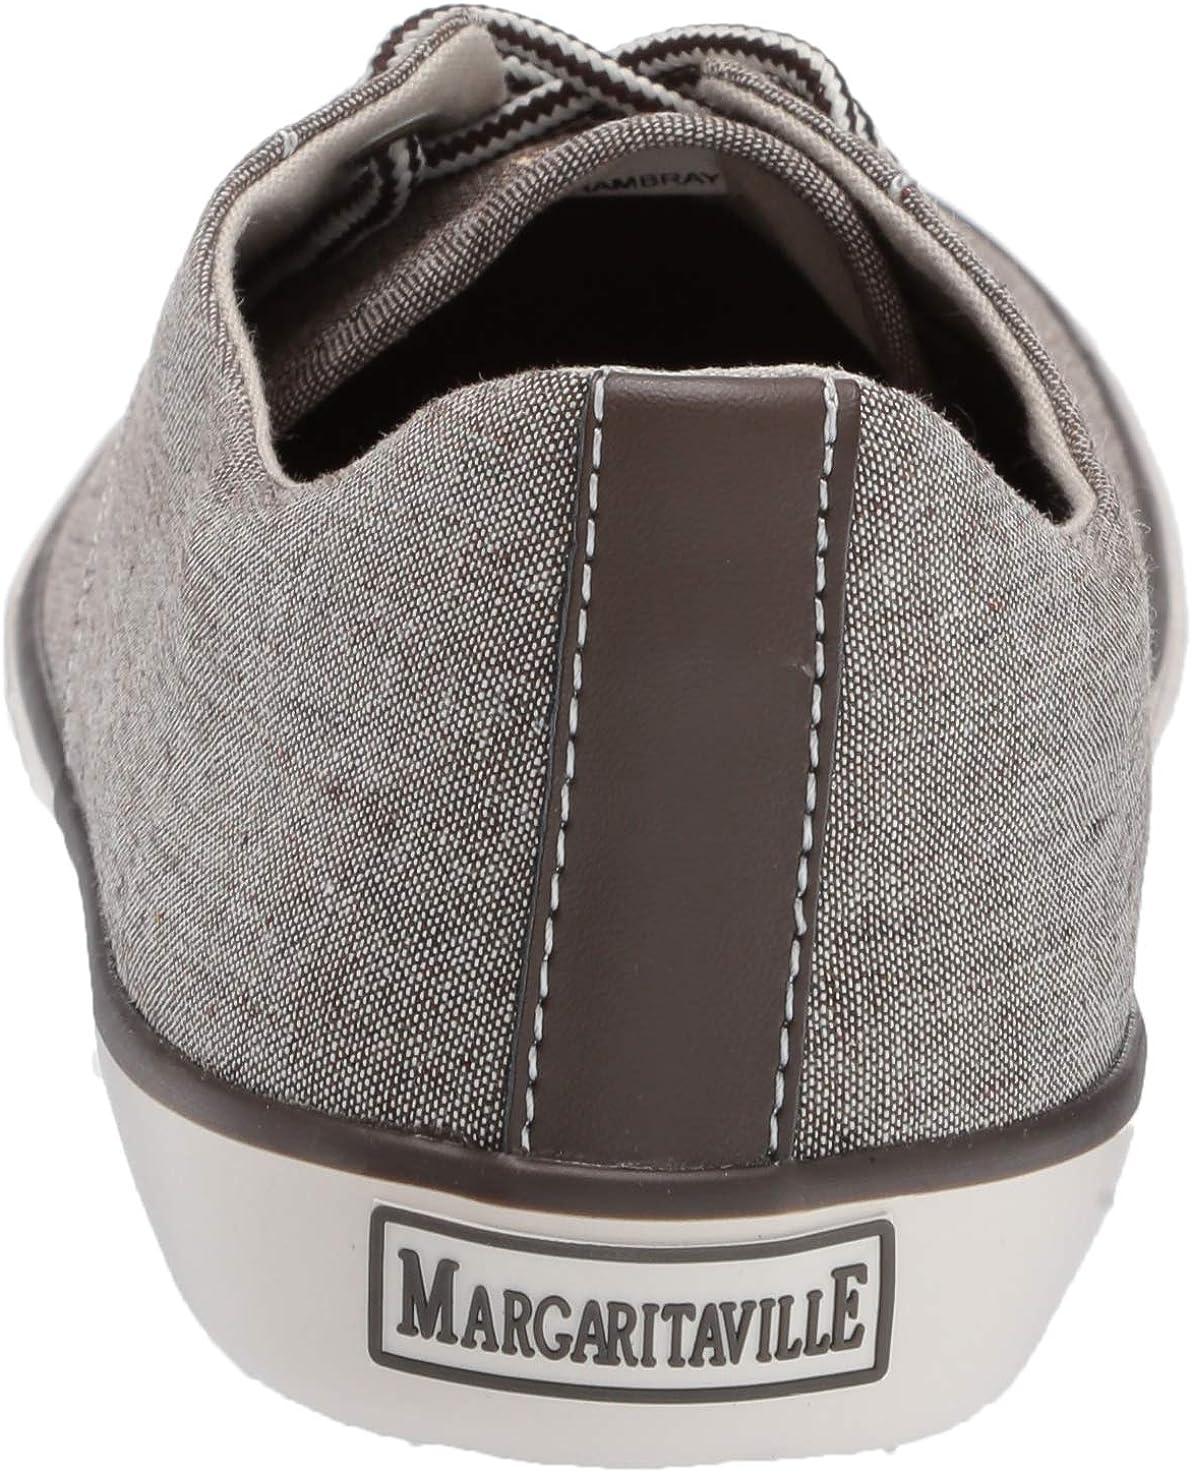 Margaritaville Mens Gustavia Chambray Casual Sneaker